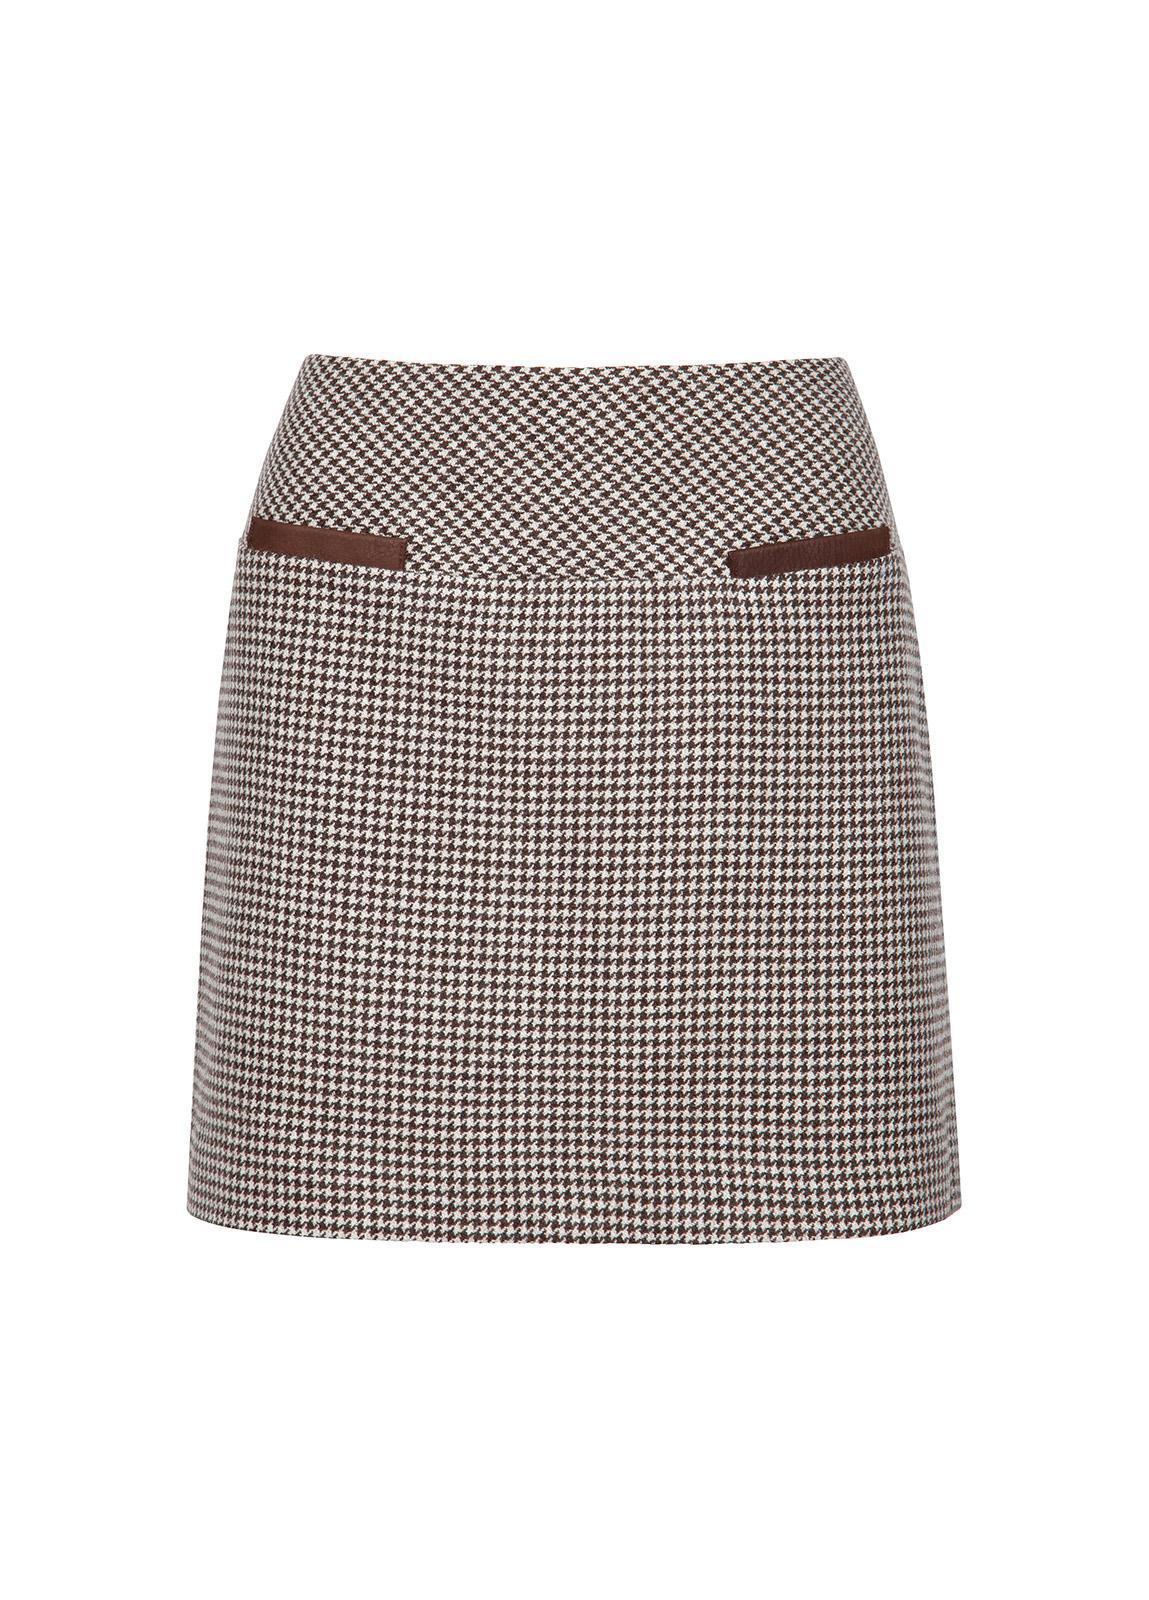 Dubarry_ Clover Tweed Mini Skirt - Cafe_Image_2